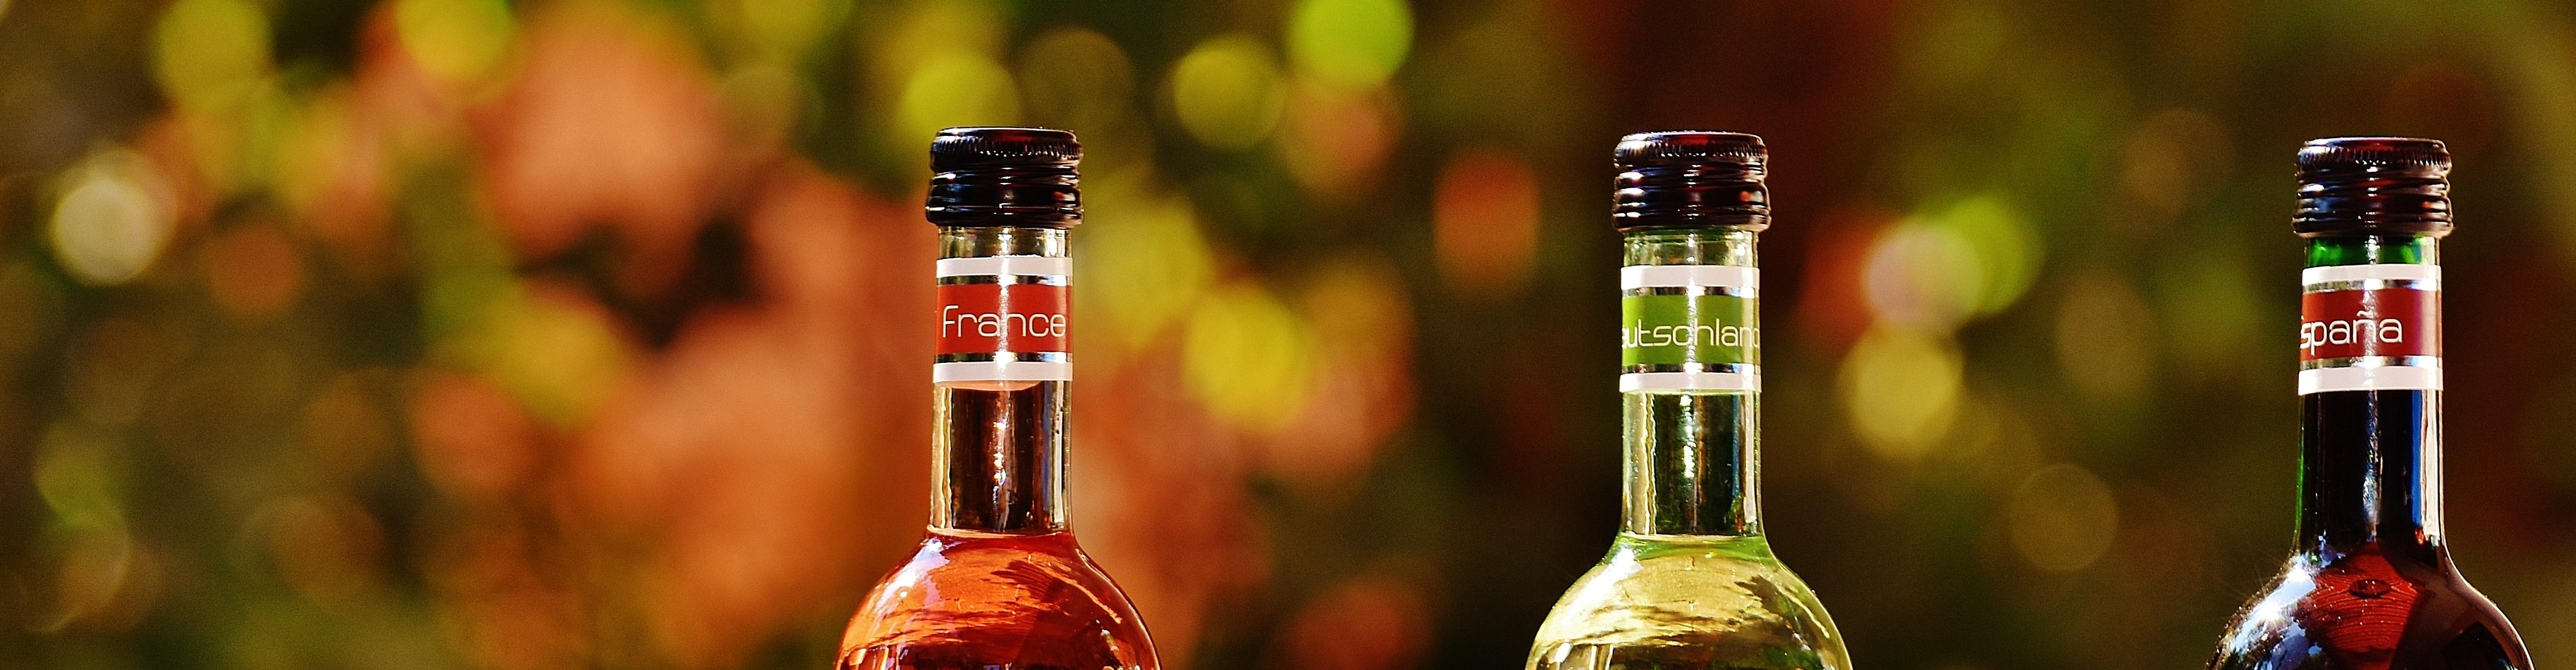 alcohol addiction impact on families